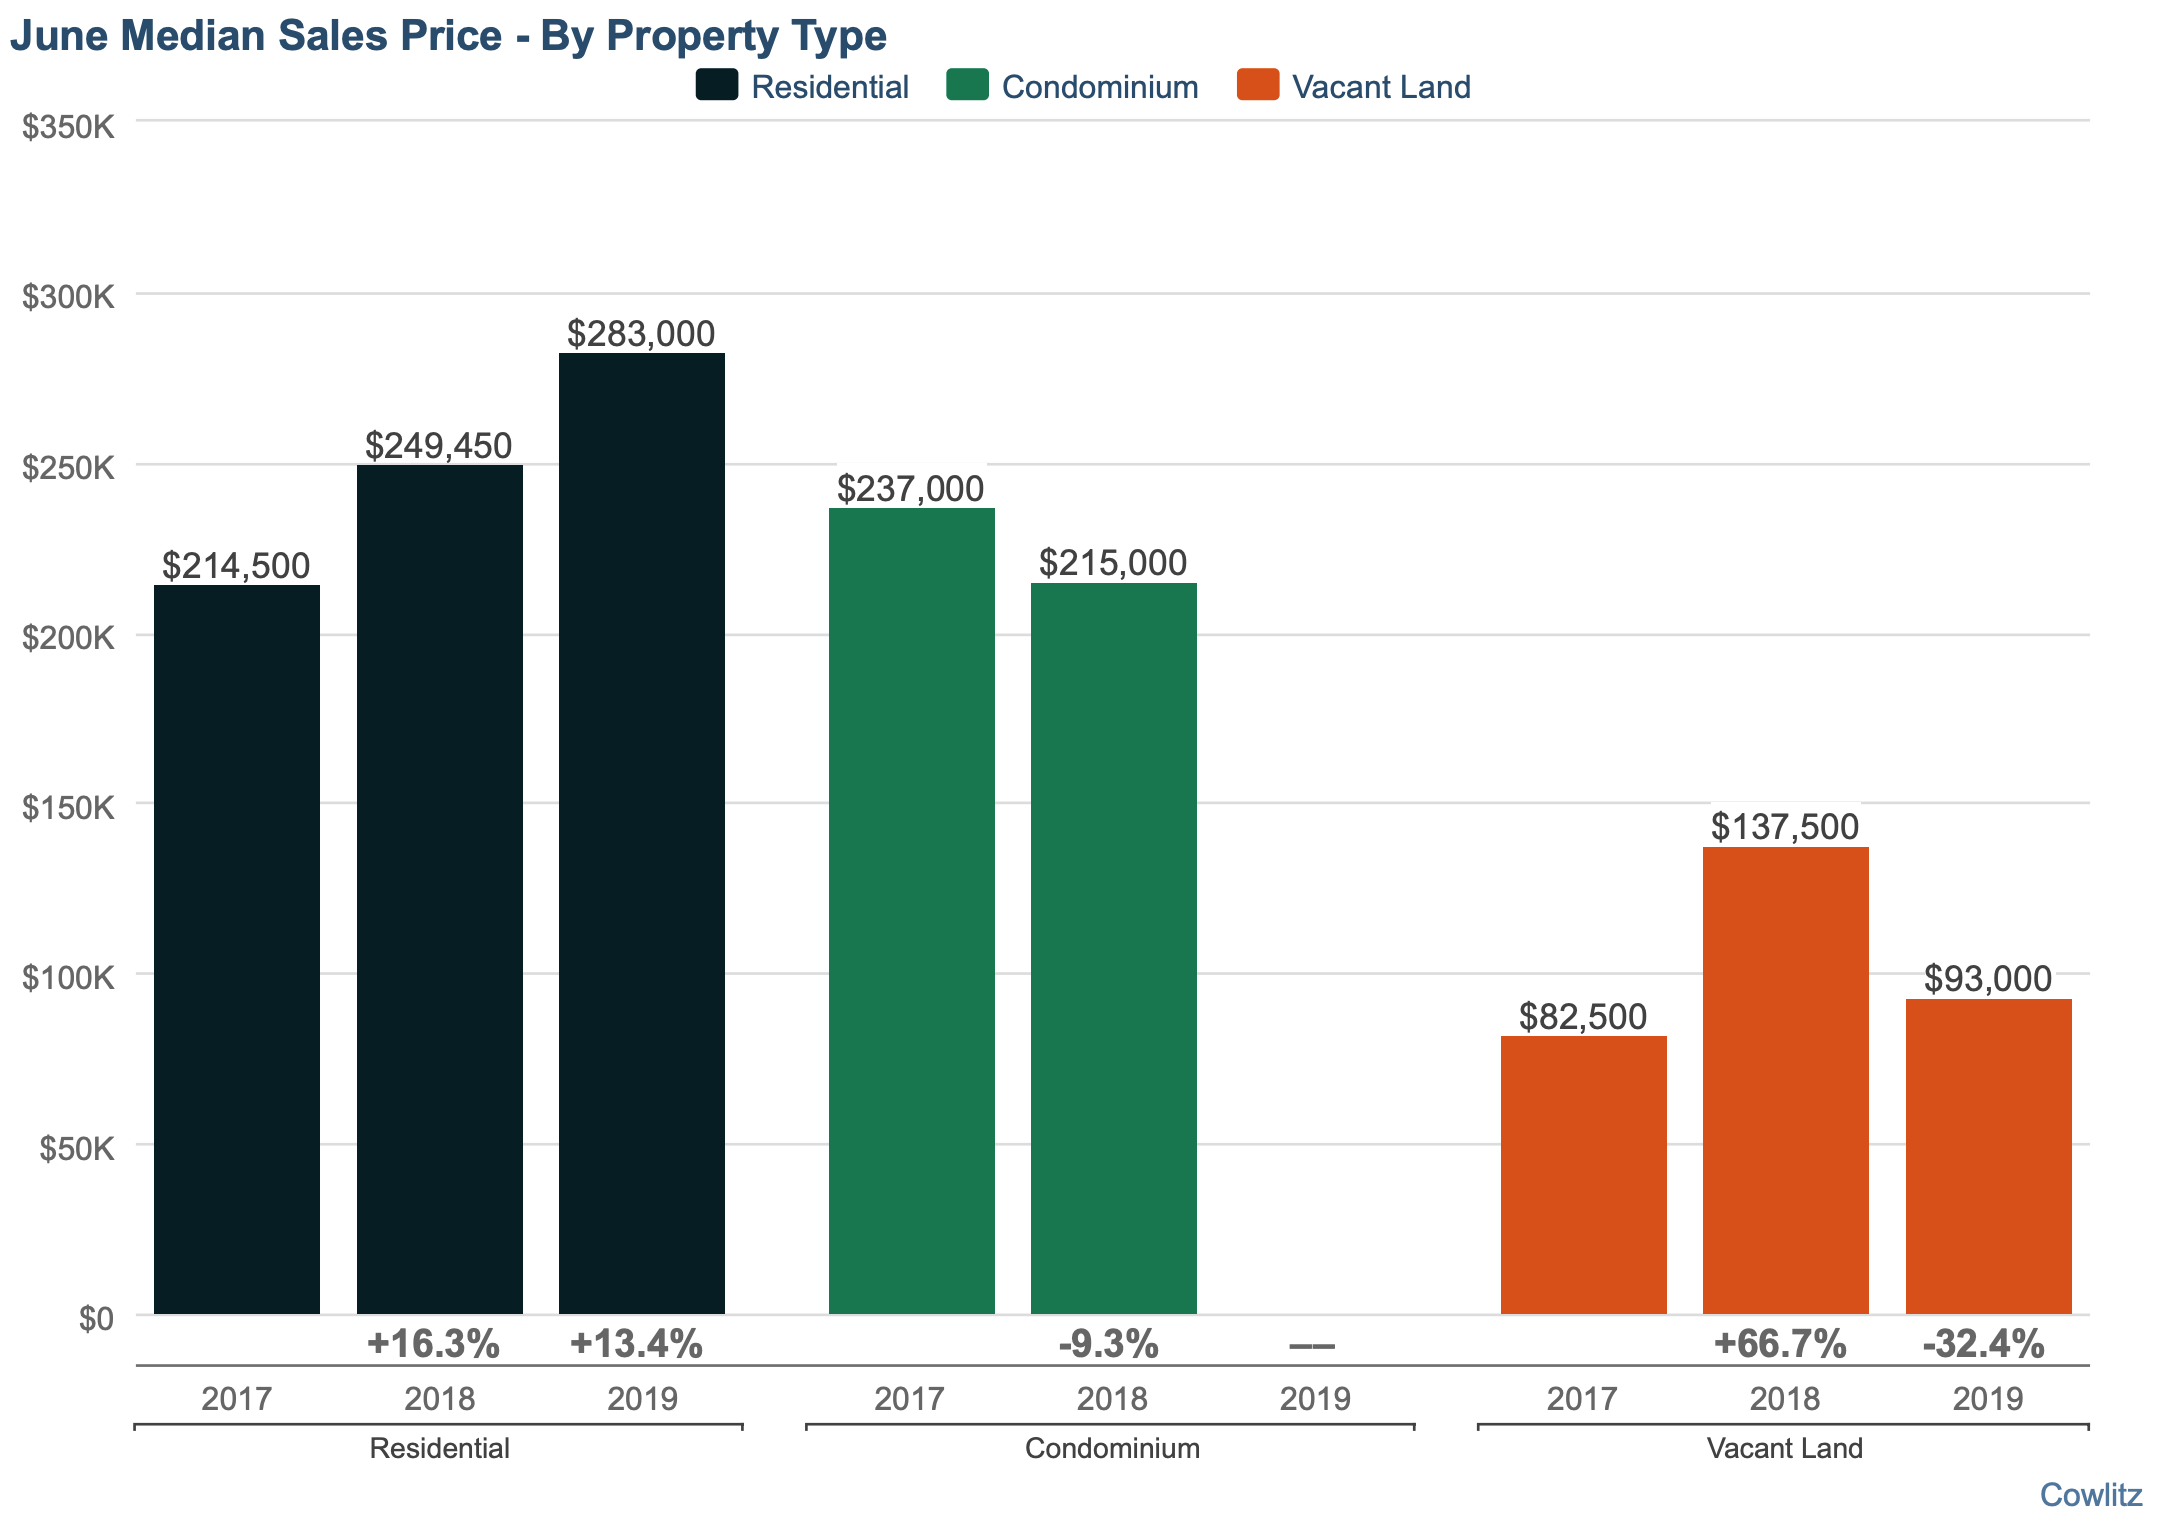 Cowlitz County Median Sales Price June 2019